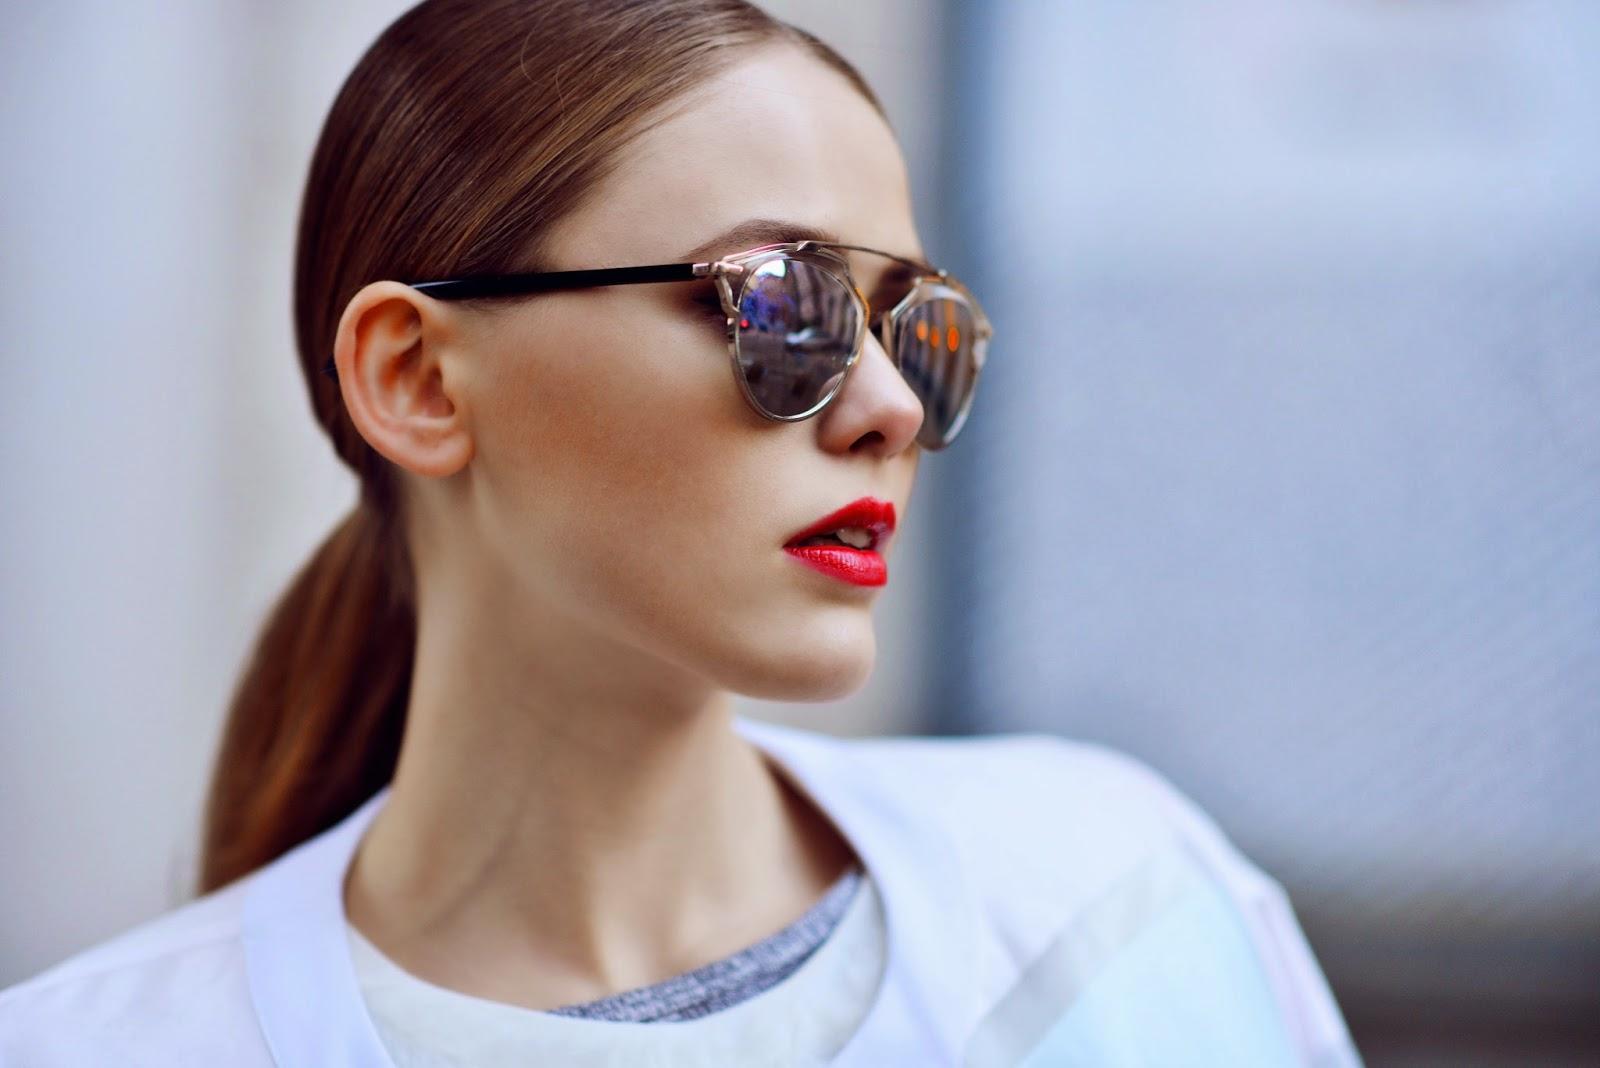 Pas Pas Homme Lunette lunettes lunettes lunettes Dior 2015 Soleil De Cher  Femme CCqY8F 61fb149af12e